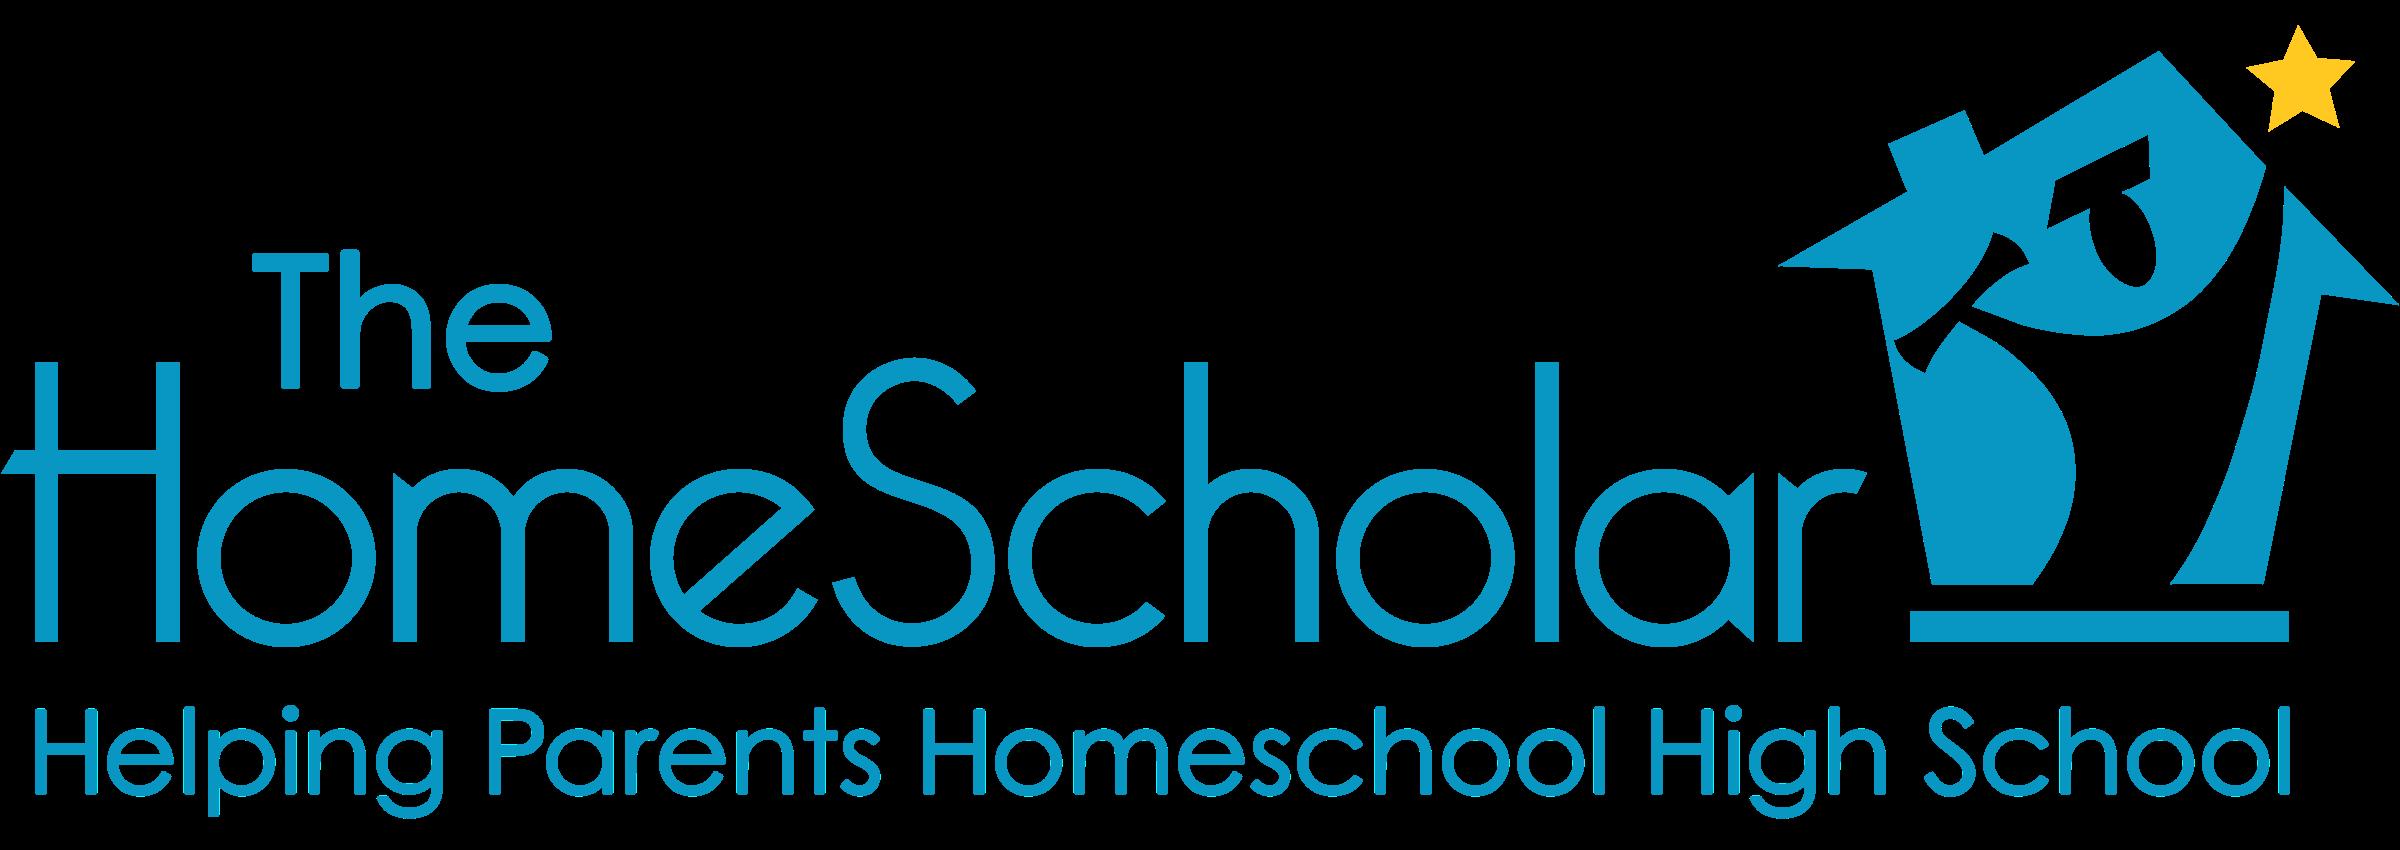 The HomeScholar